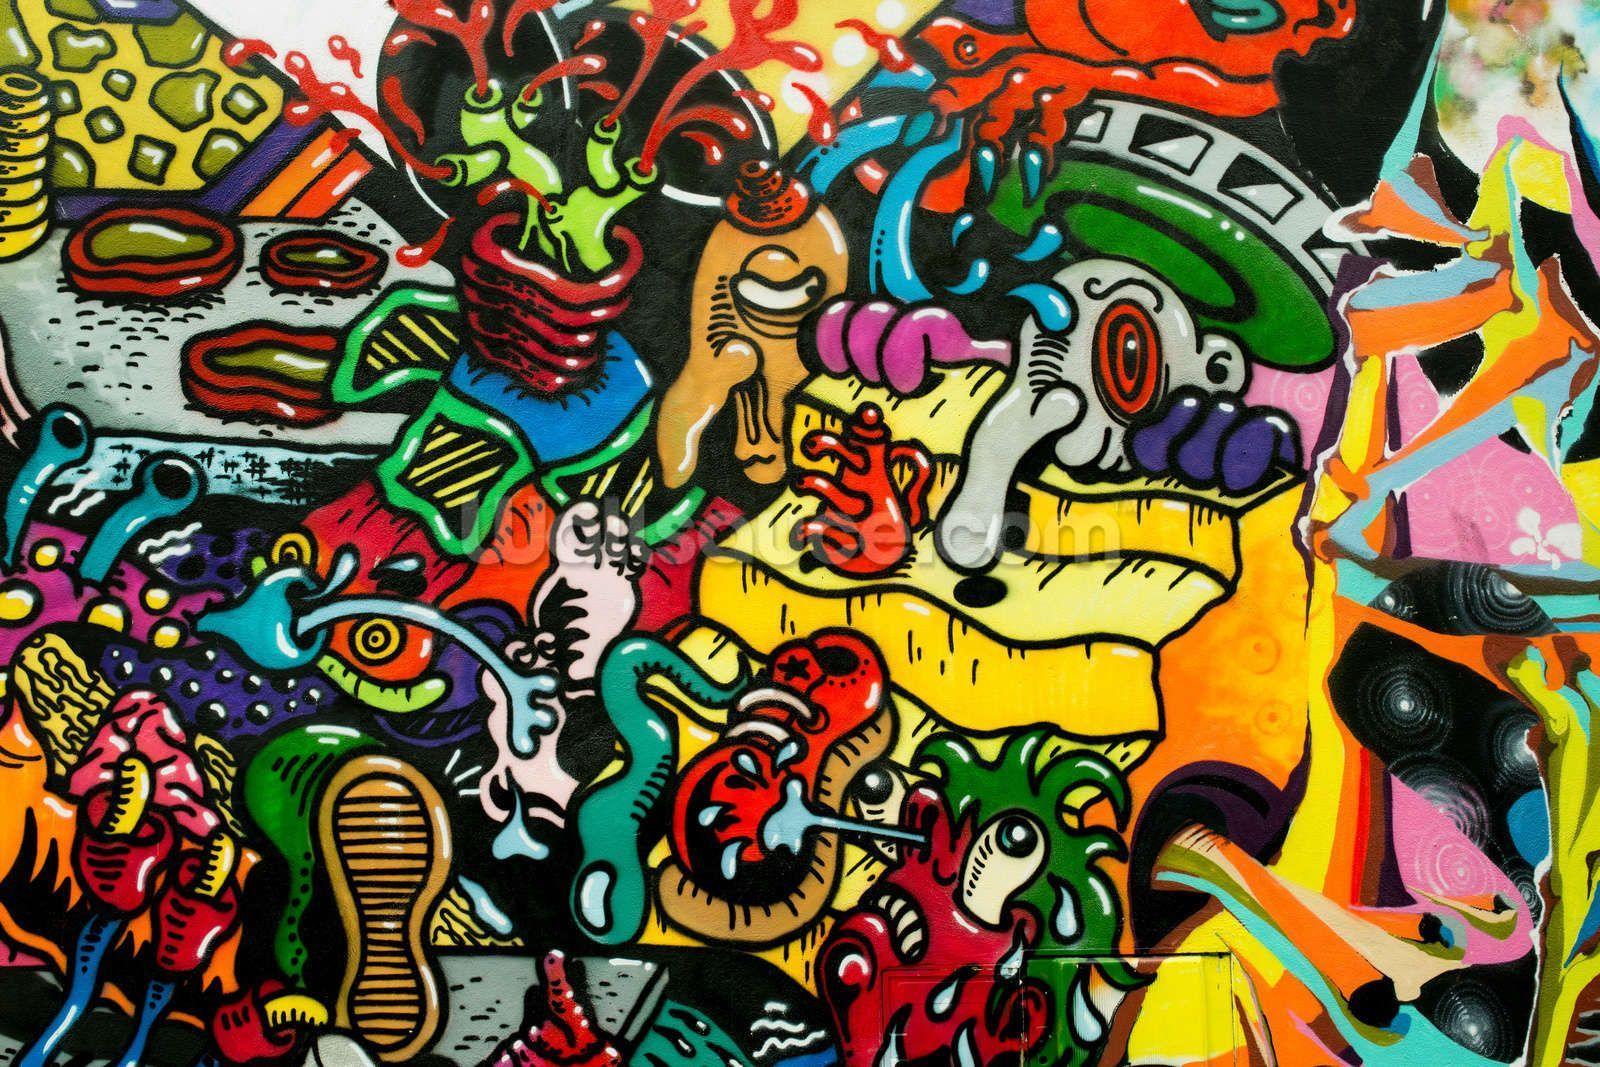 Cool Graffiti Wallpapers - Top Free Cool Graffiti Backgrounds - WallpaperAccess